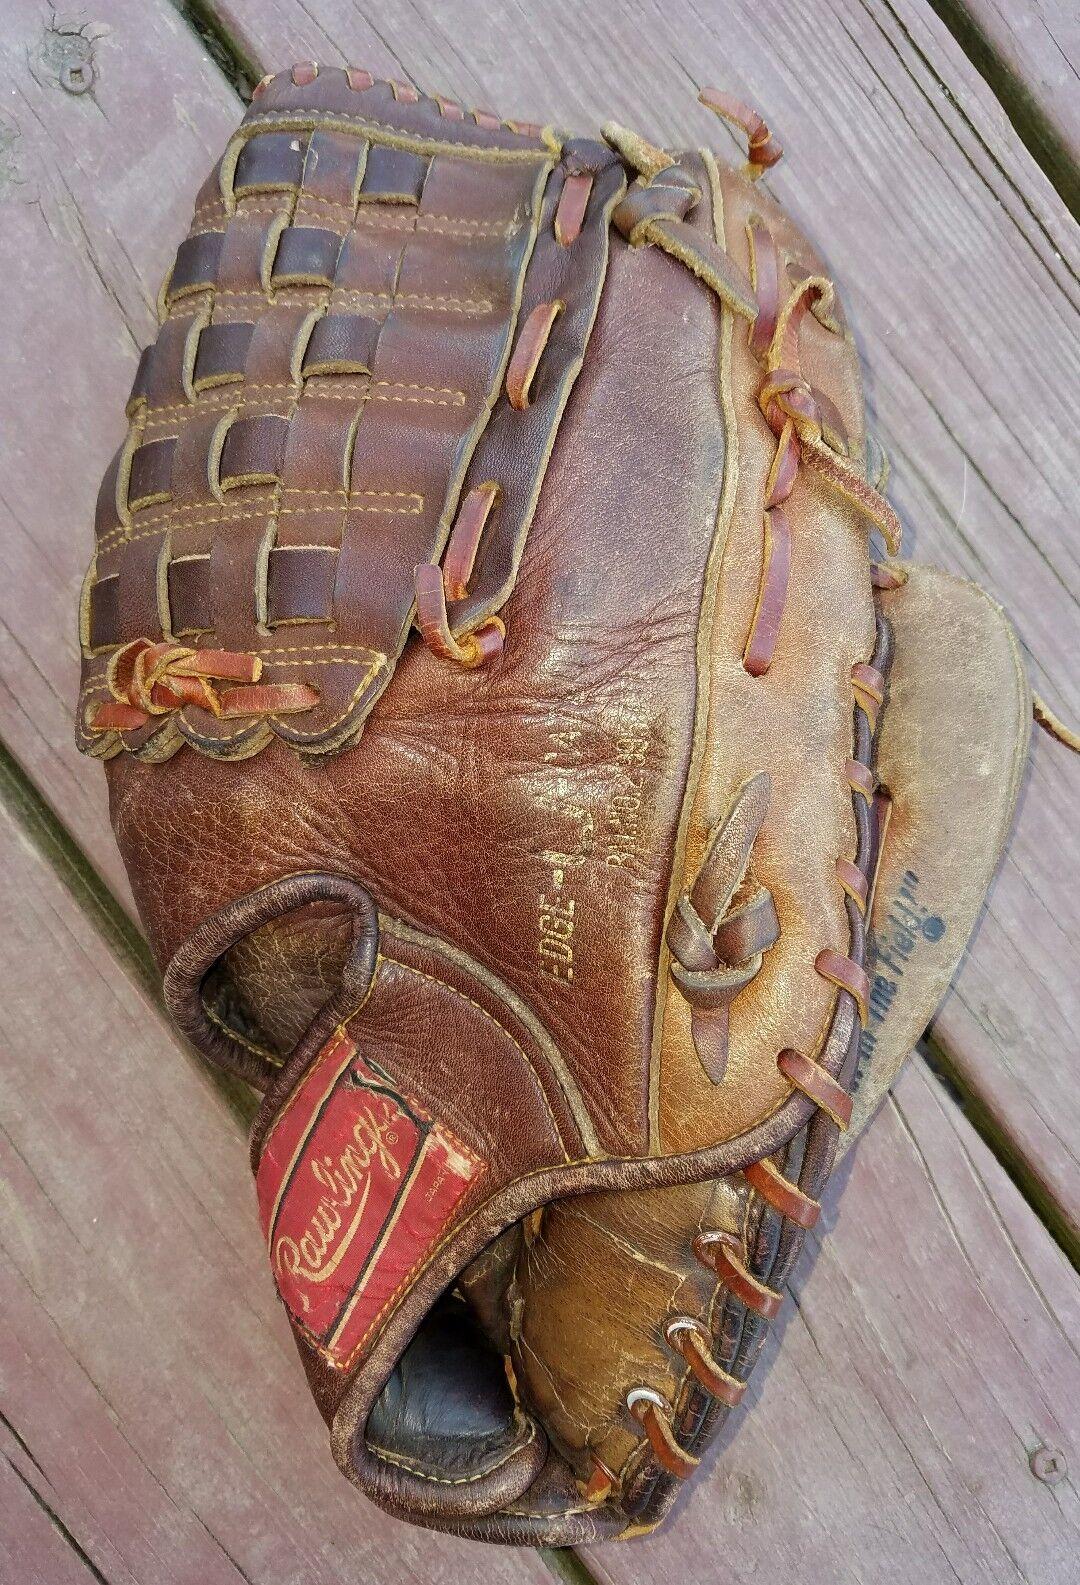 Vintage Raro Rawlings RA-75 75th aniversario 12.5  Guante de béisbol Mano Derecha-Throw